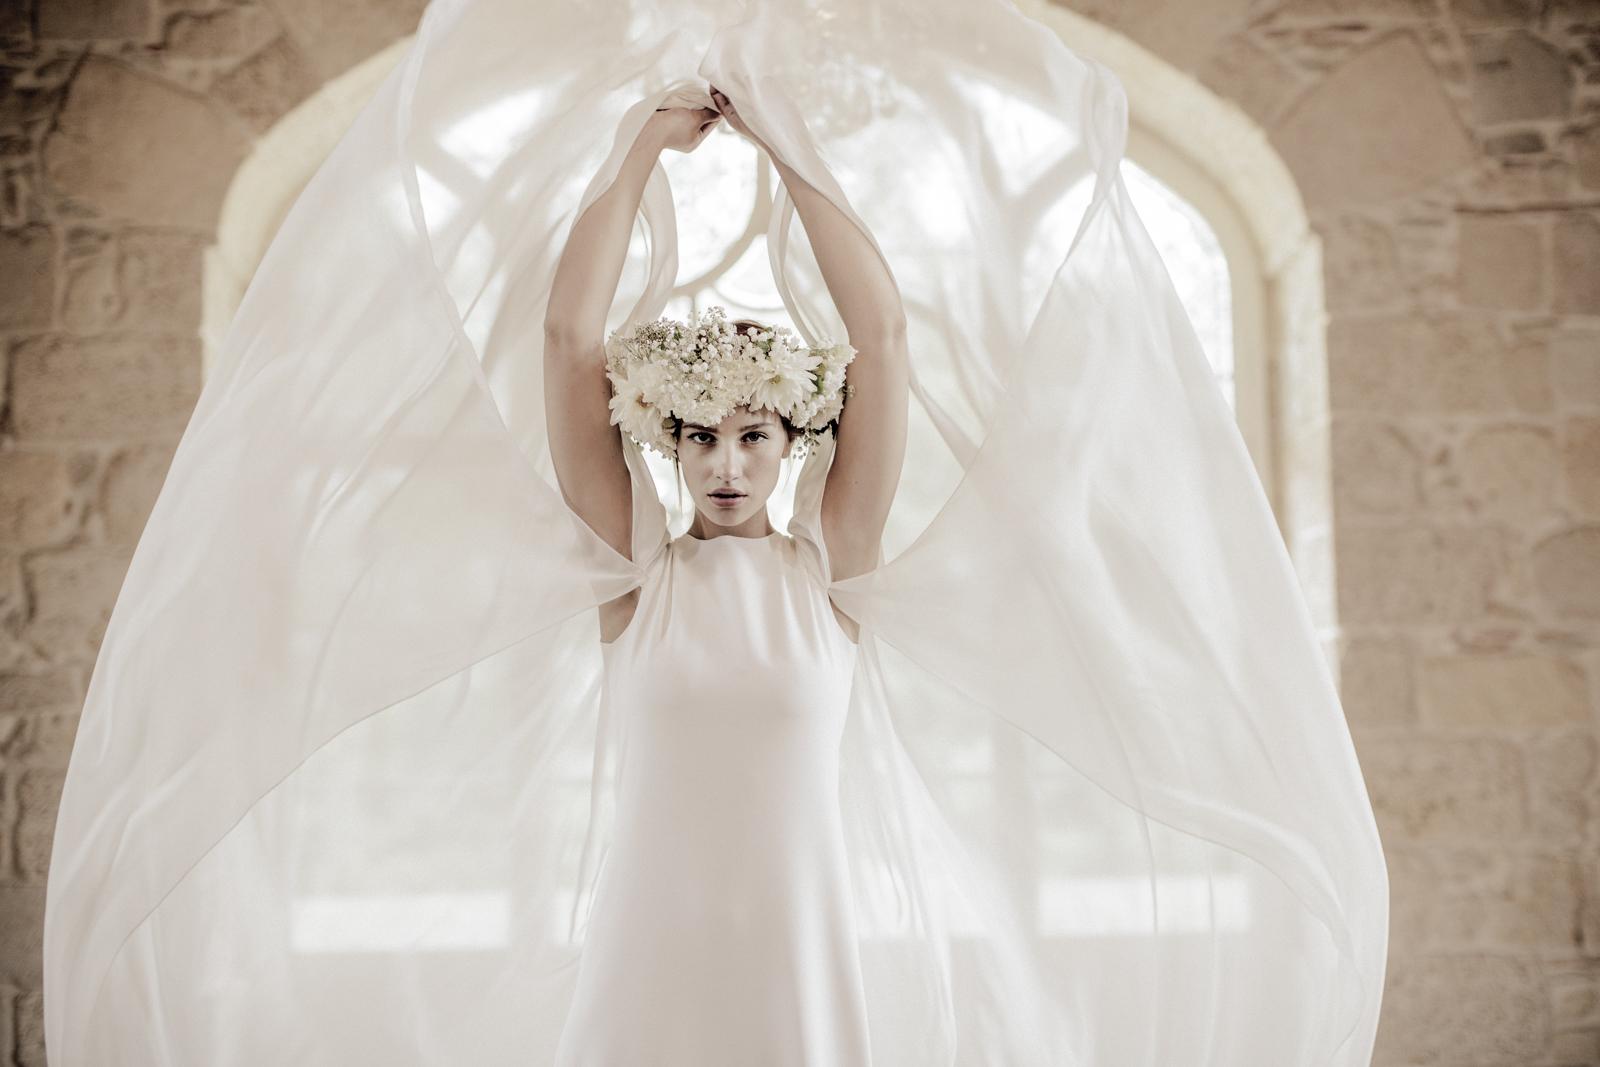 Robe de mariee sur mesure bruxelles